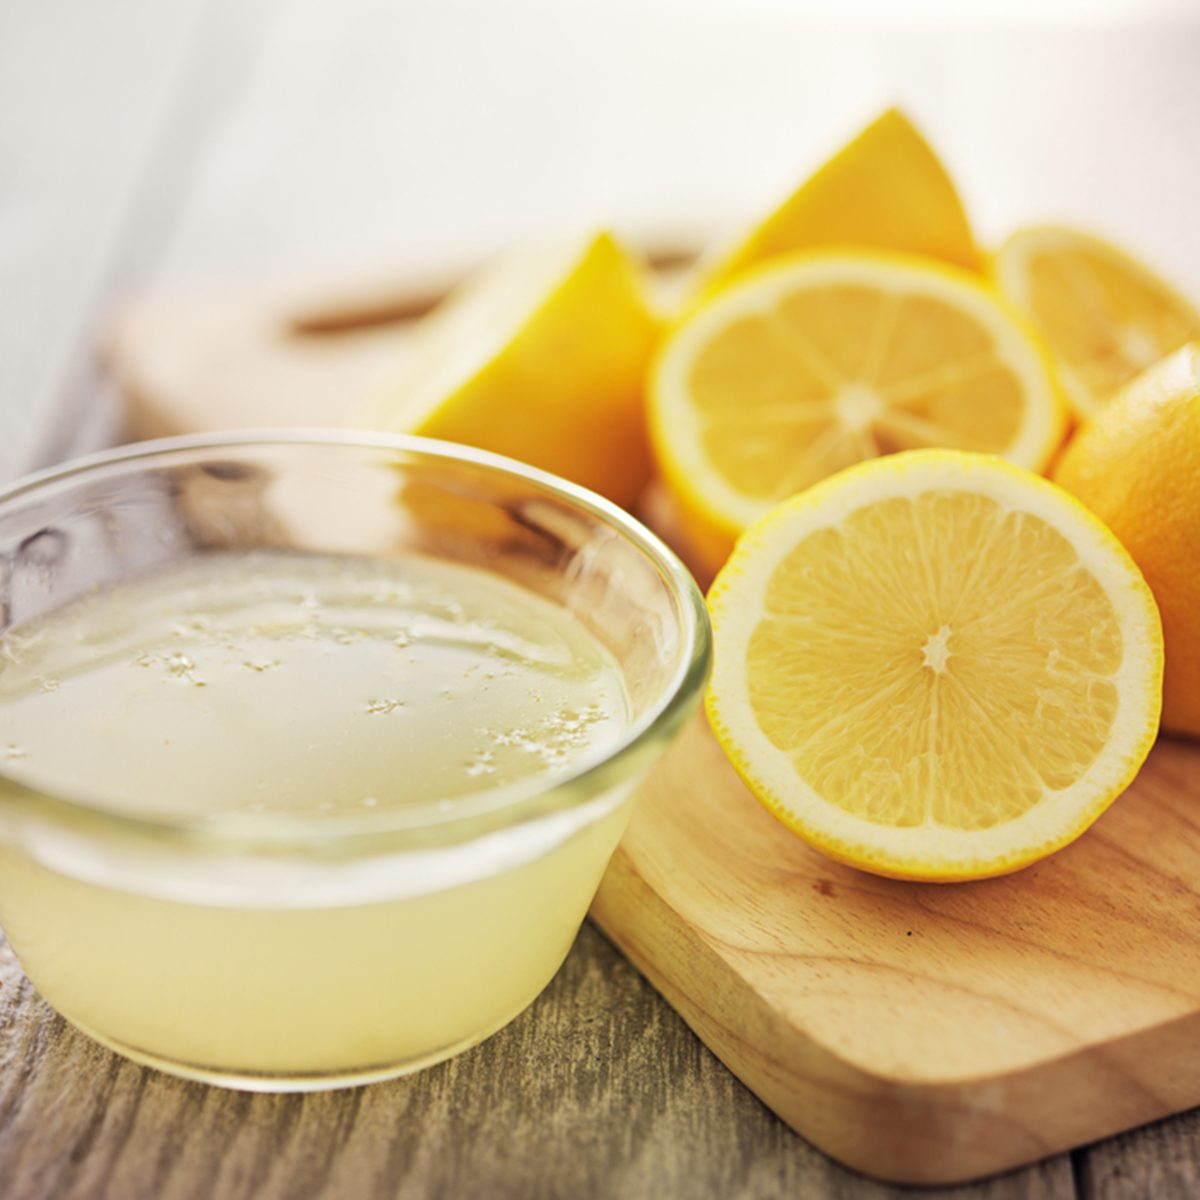 freshly squeezed lemon juice in small bowl; Shutterstock ID 211542739